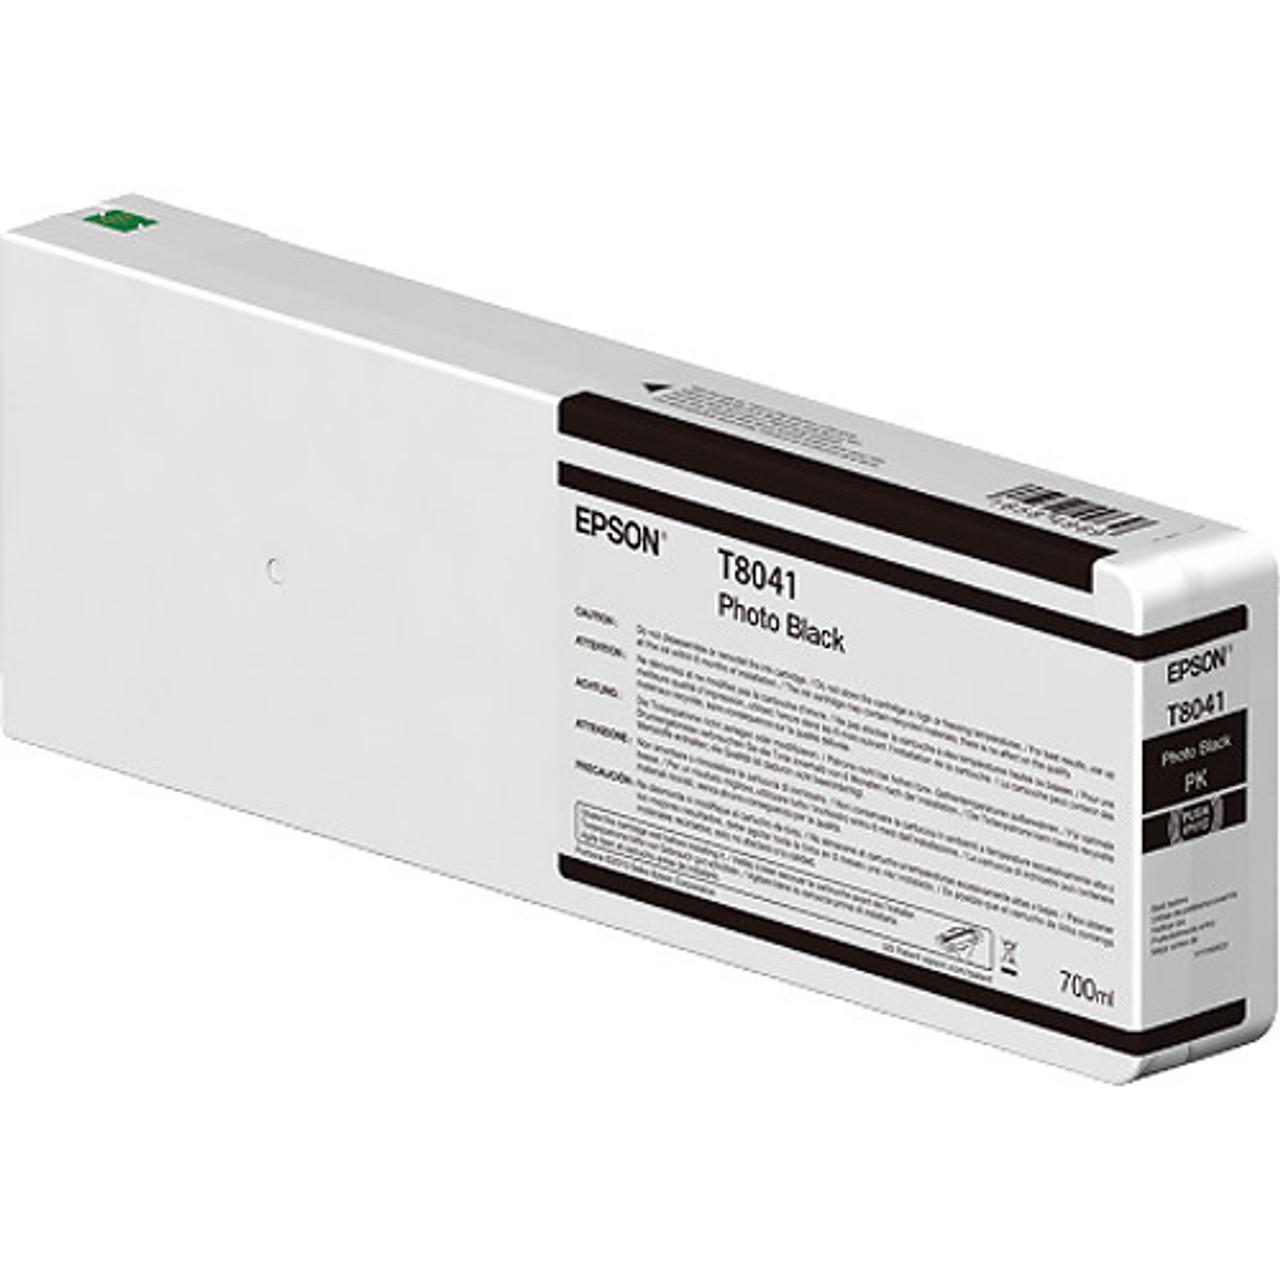 Epson T804100 Photo Black Ink Cartridge, 700 mL